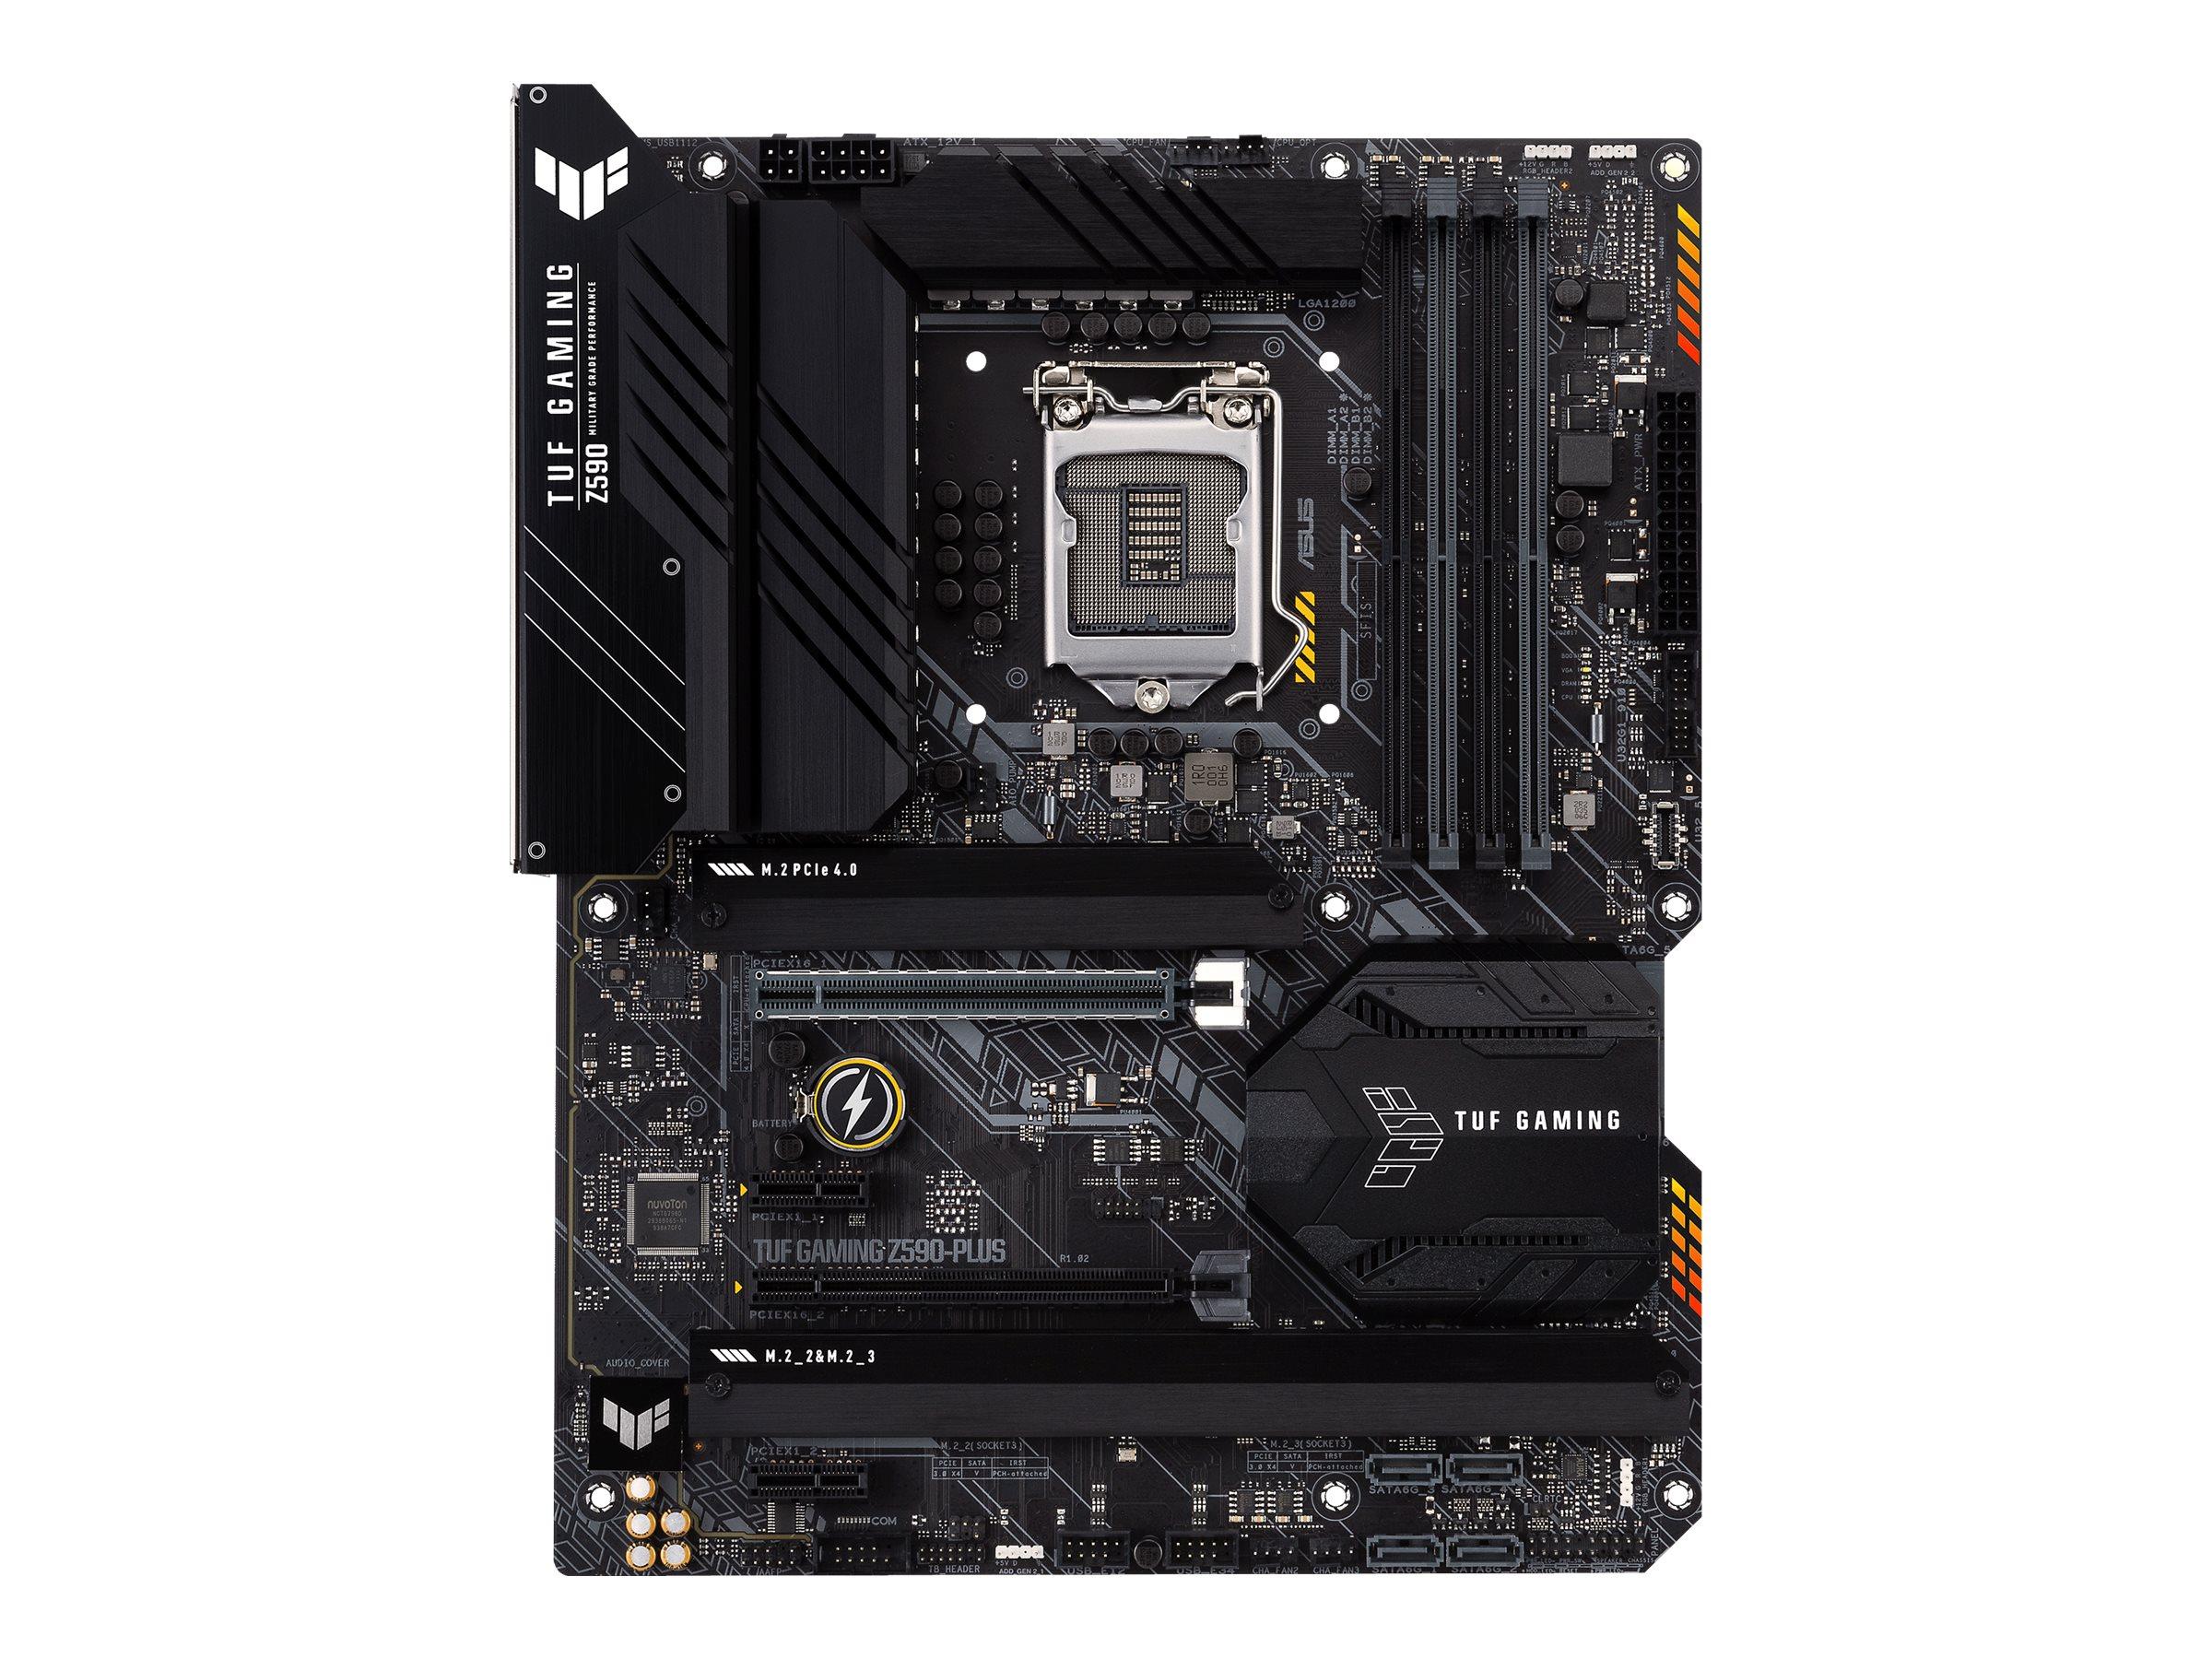 ASUS TUF GAMING Z590-PLUS - motherboard - ATX - LGA1200 Socket - Z590